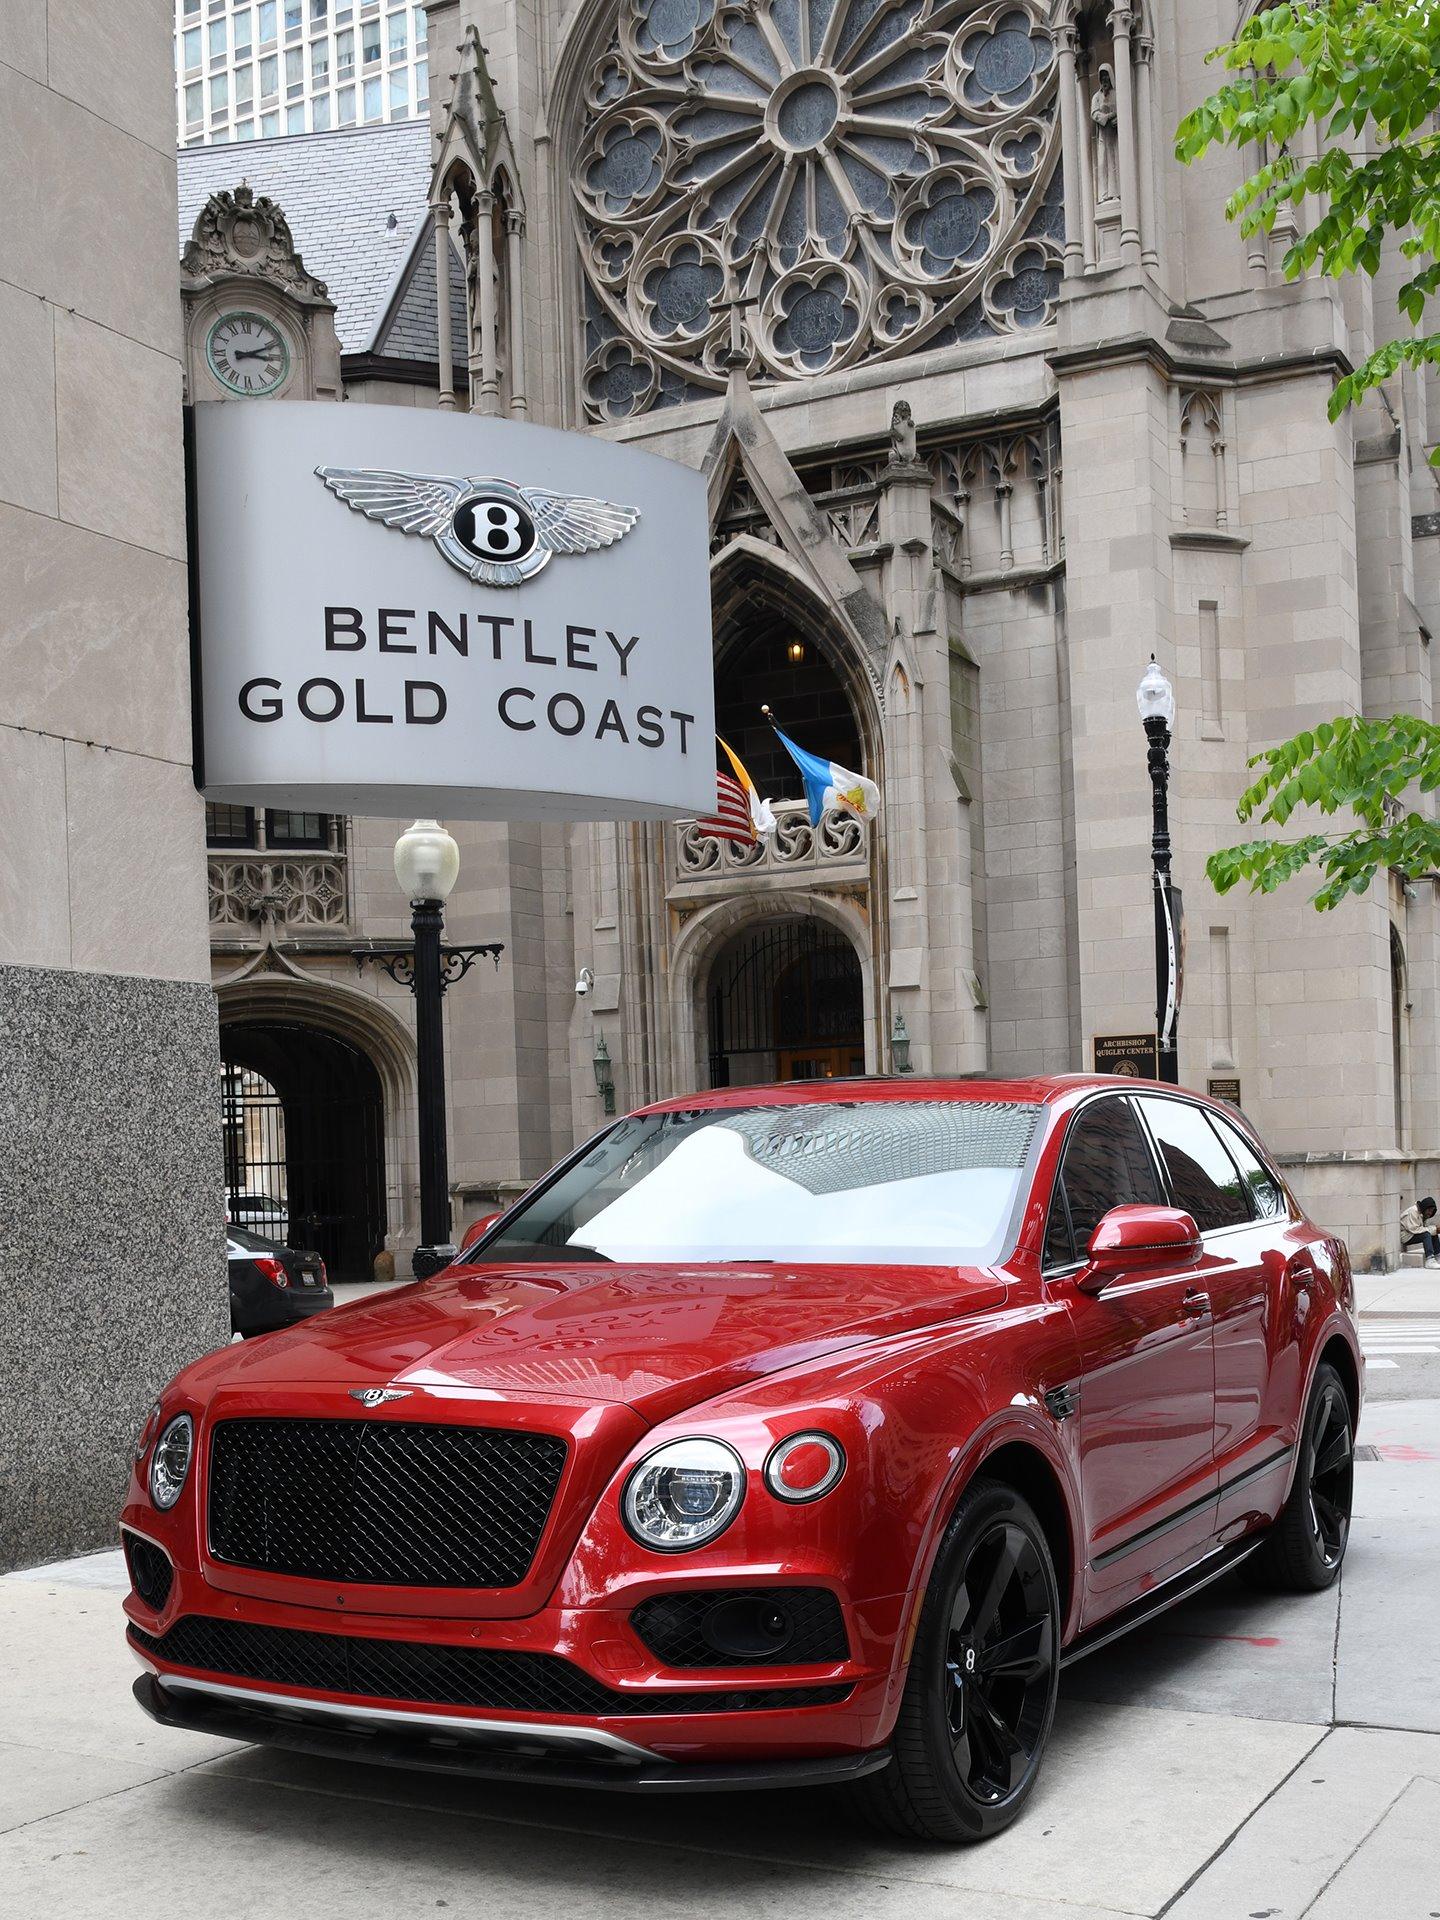 bentley gold coast, 834 north rush street, chicago il 60611 | buy